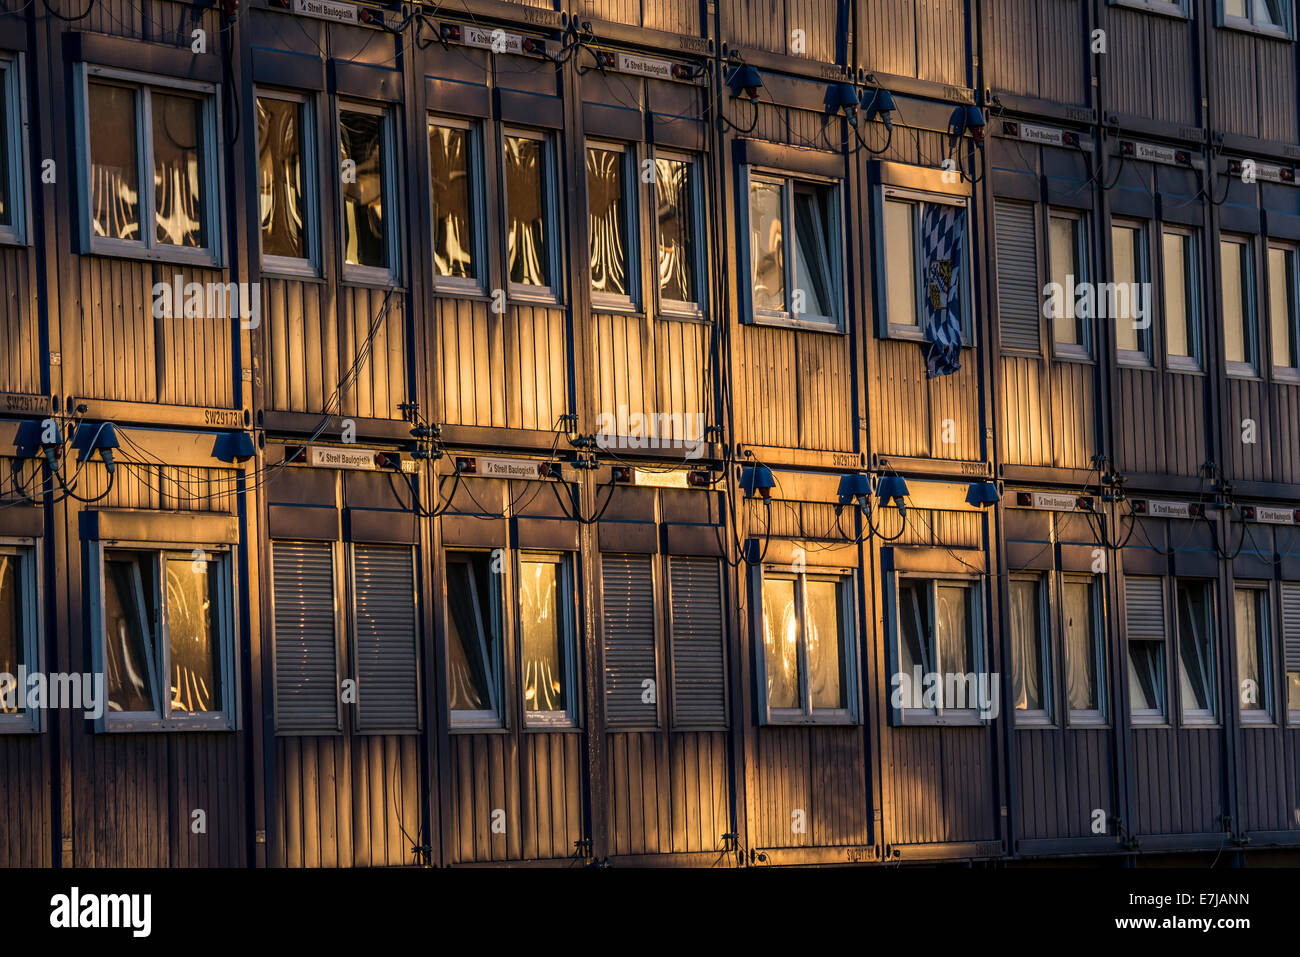 Portakabins or portacabins, HafenCity quarter, Hamburg, Germany - Stock Image